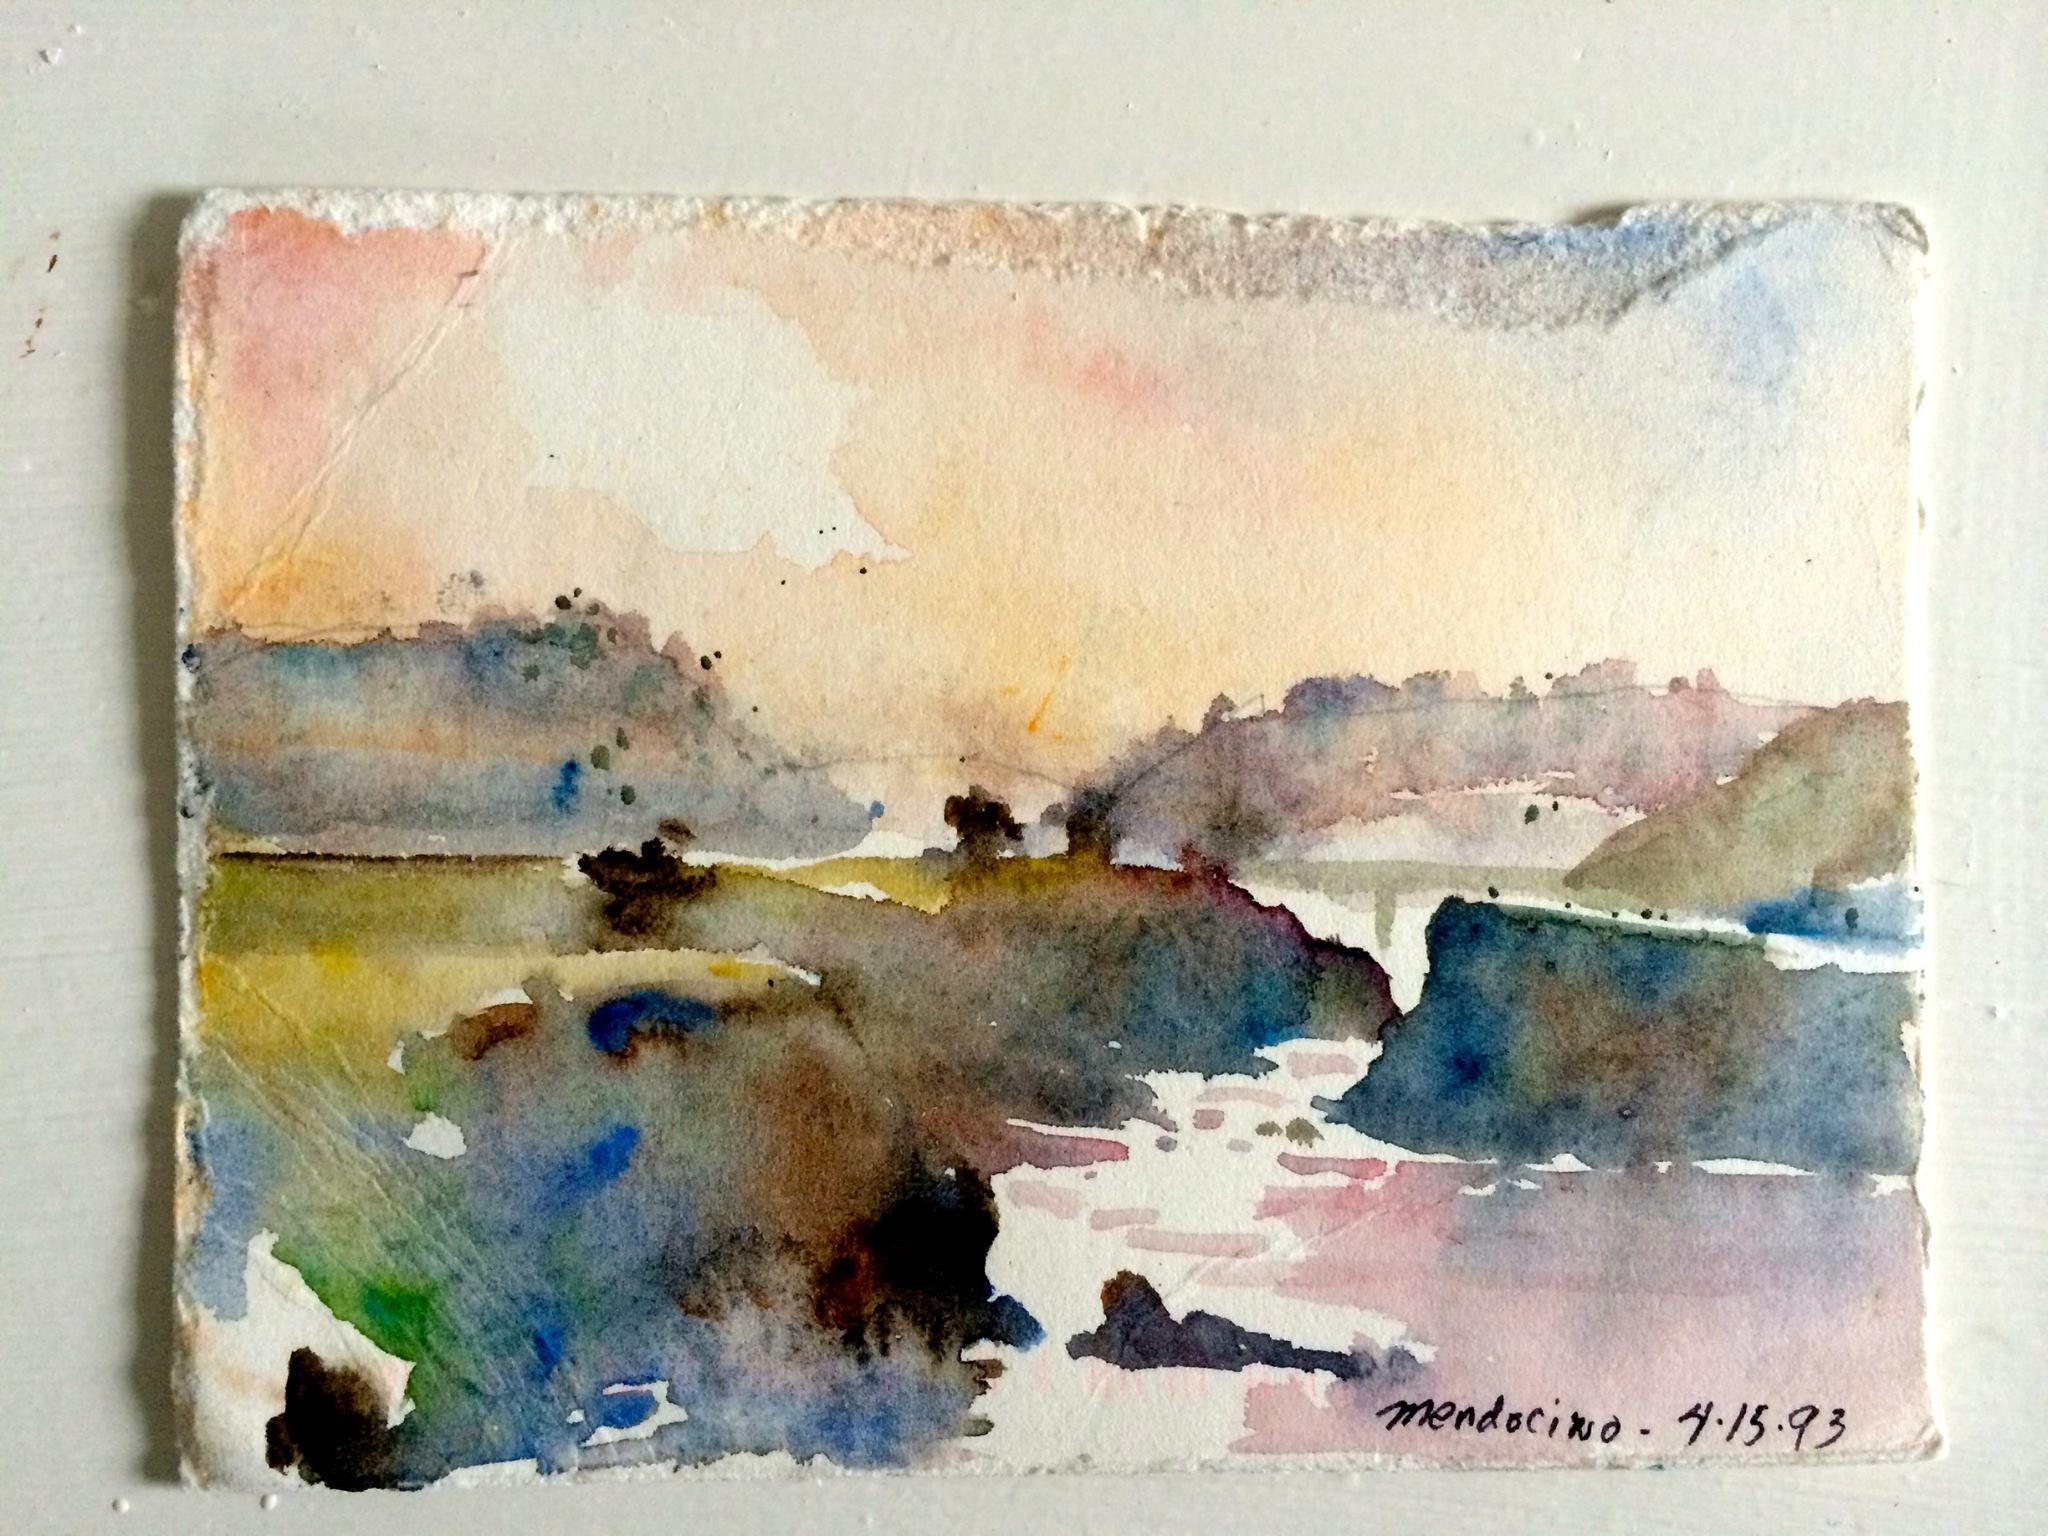 Charles Reid Watercolor Landscape Paintings Painting Landscape